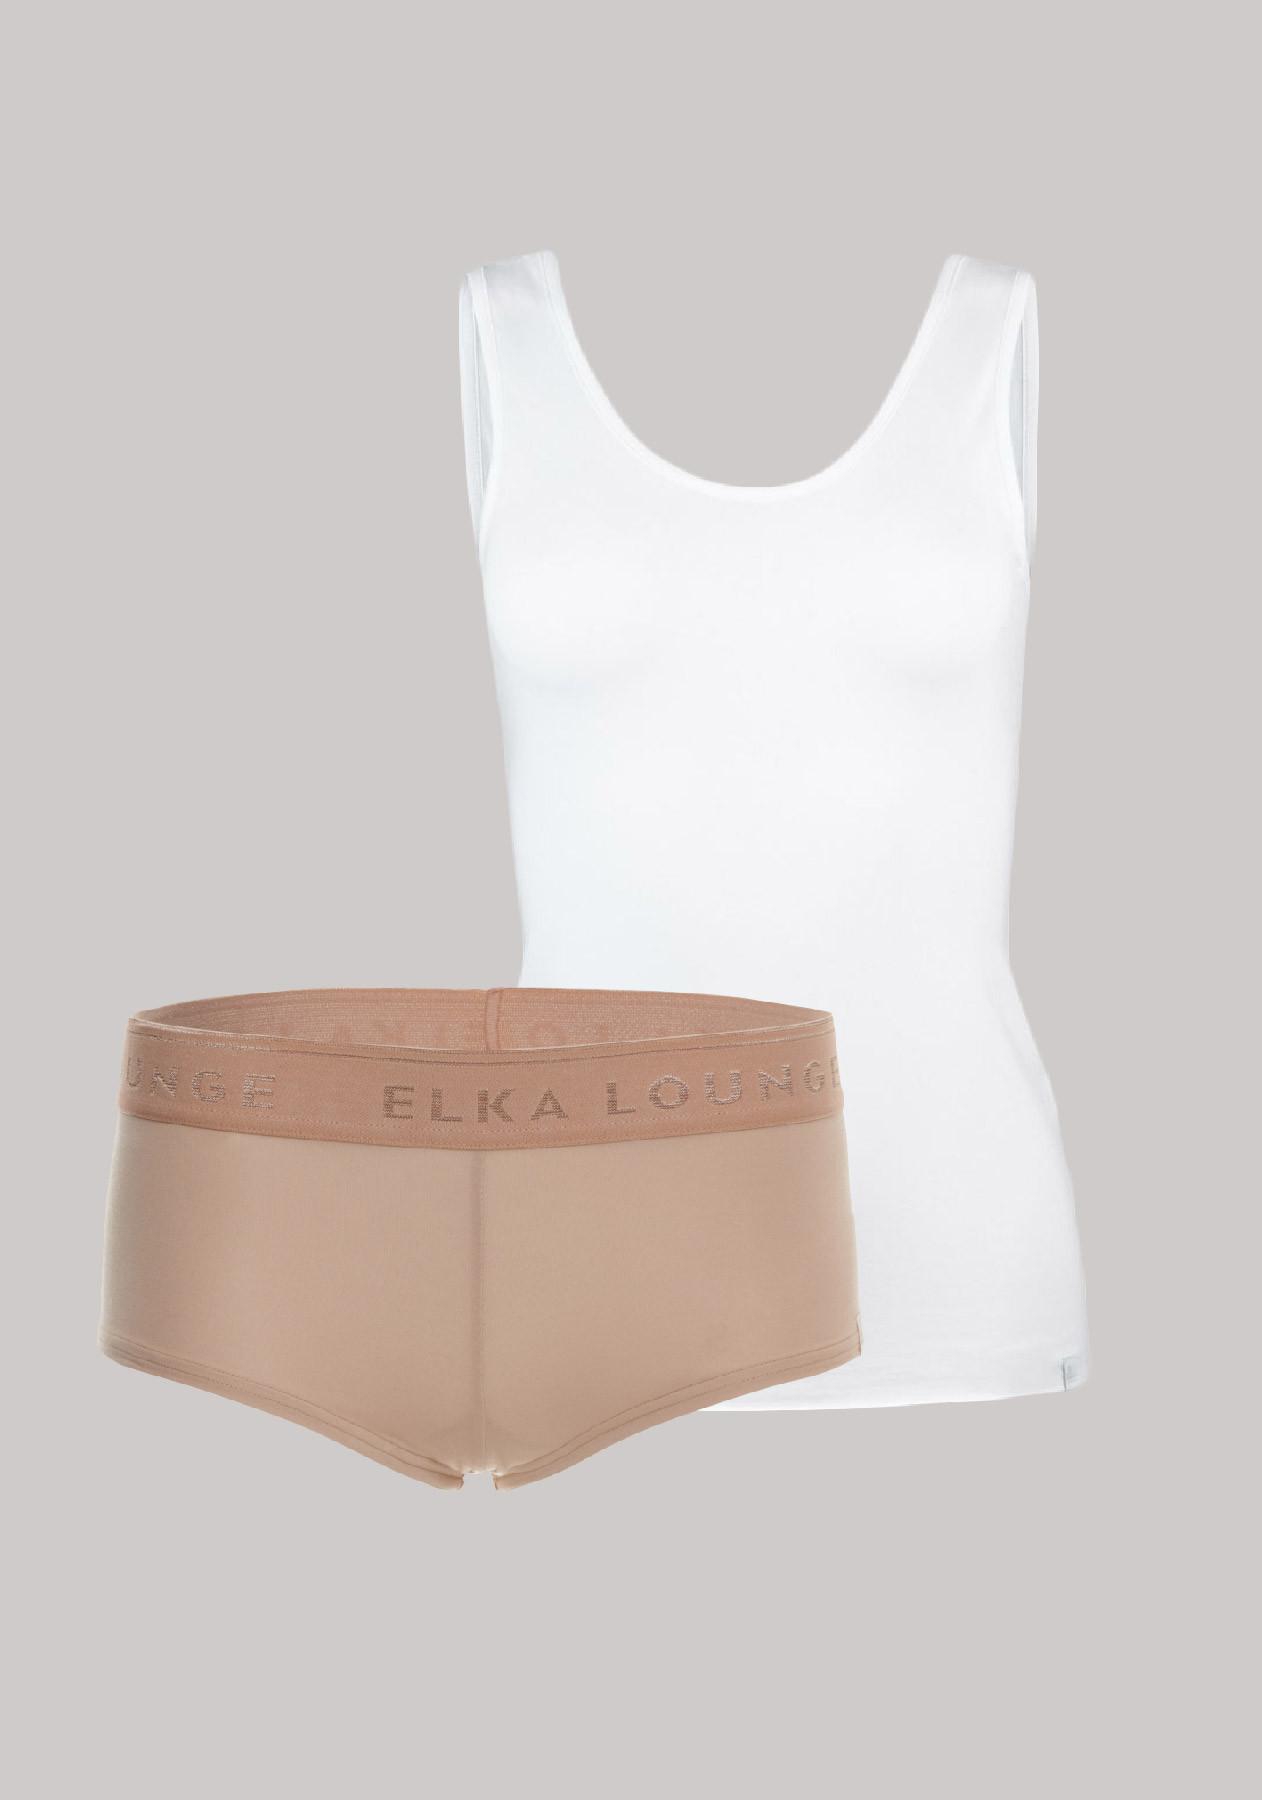 Women-Top-BackU, boxers-ELKA-Lounge-W00023,547